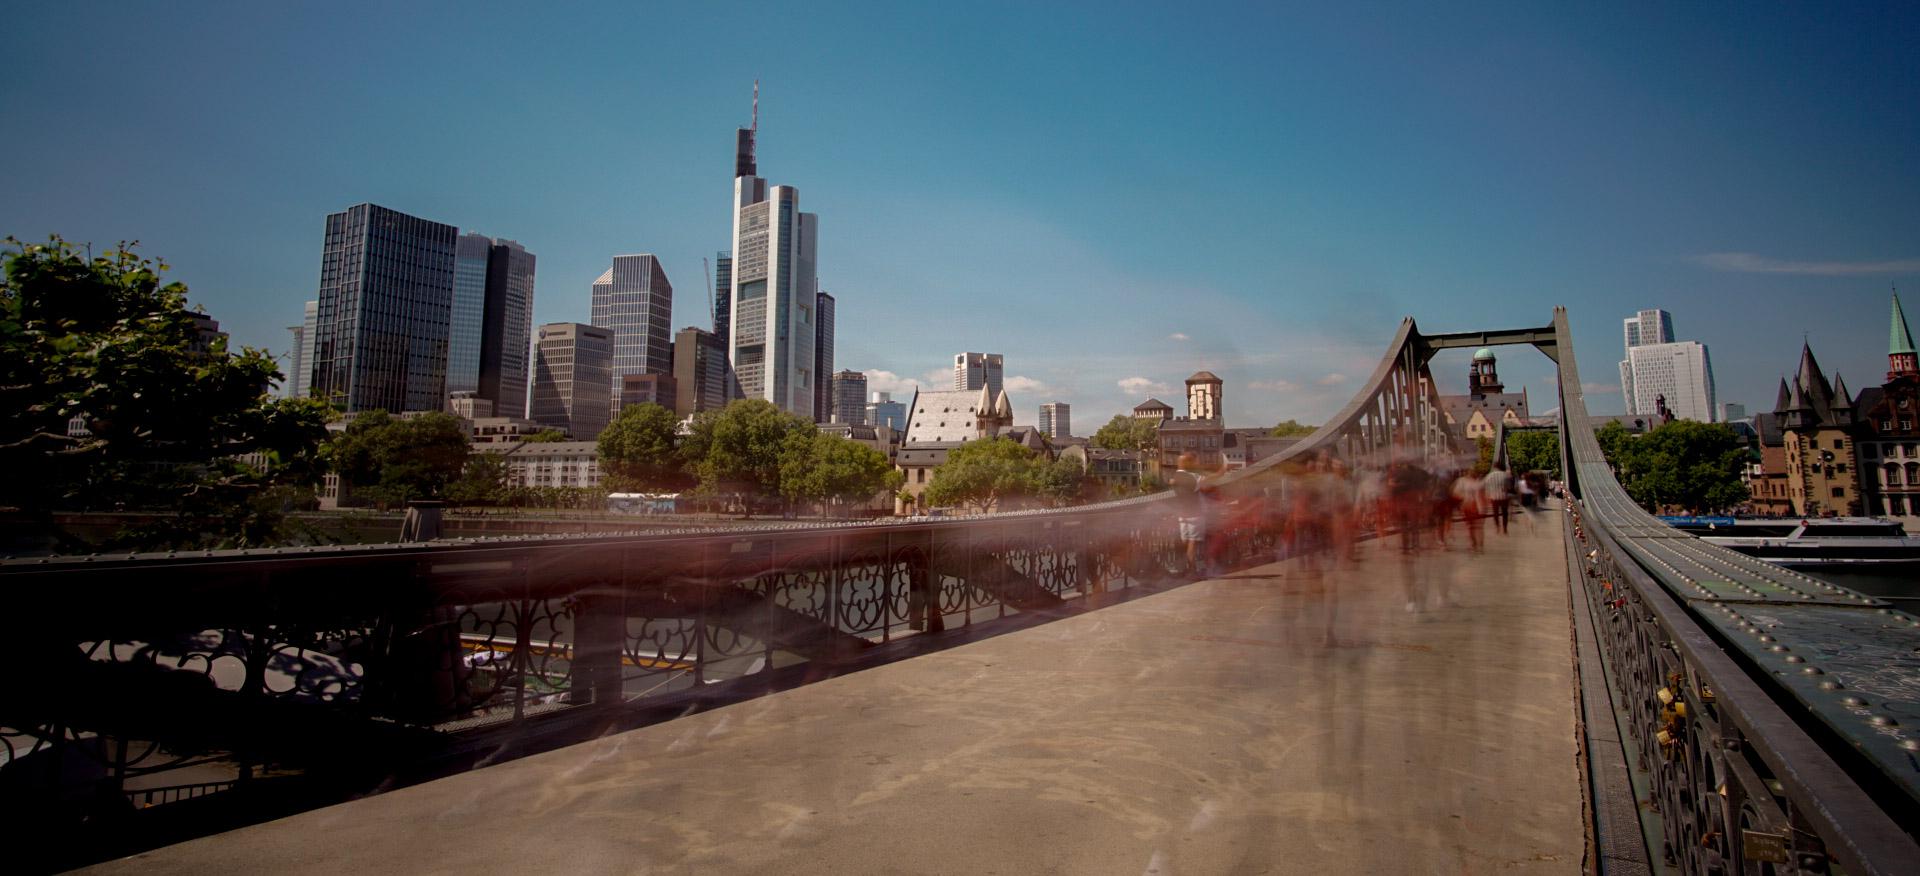 Eiserner Steg Frankfurt Skyline, Germany